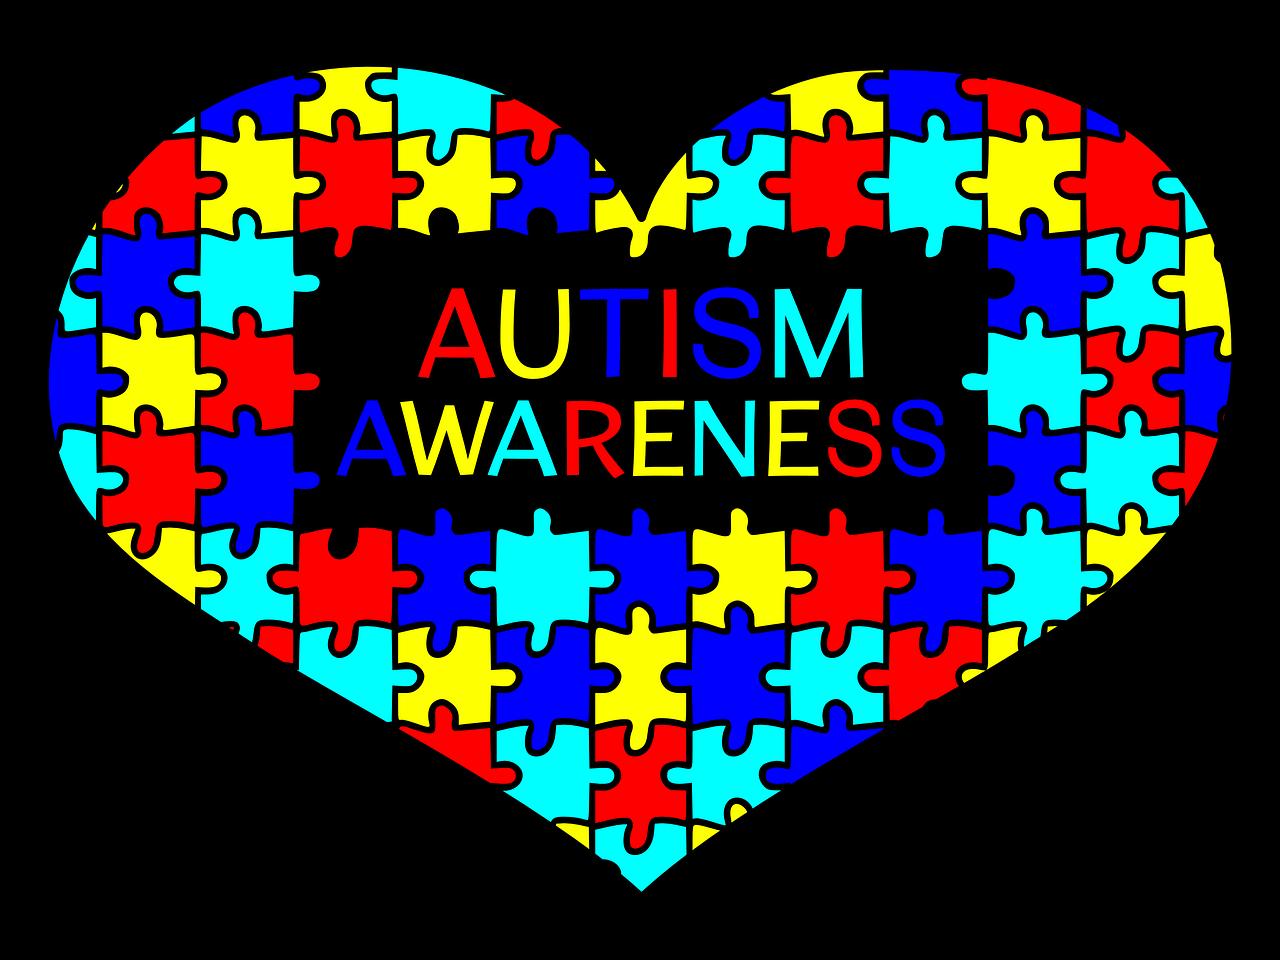 heart, autism awareness, support